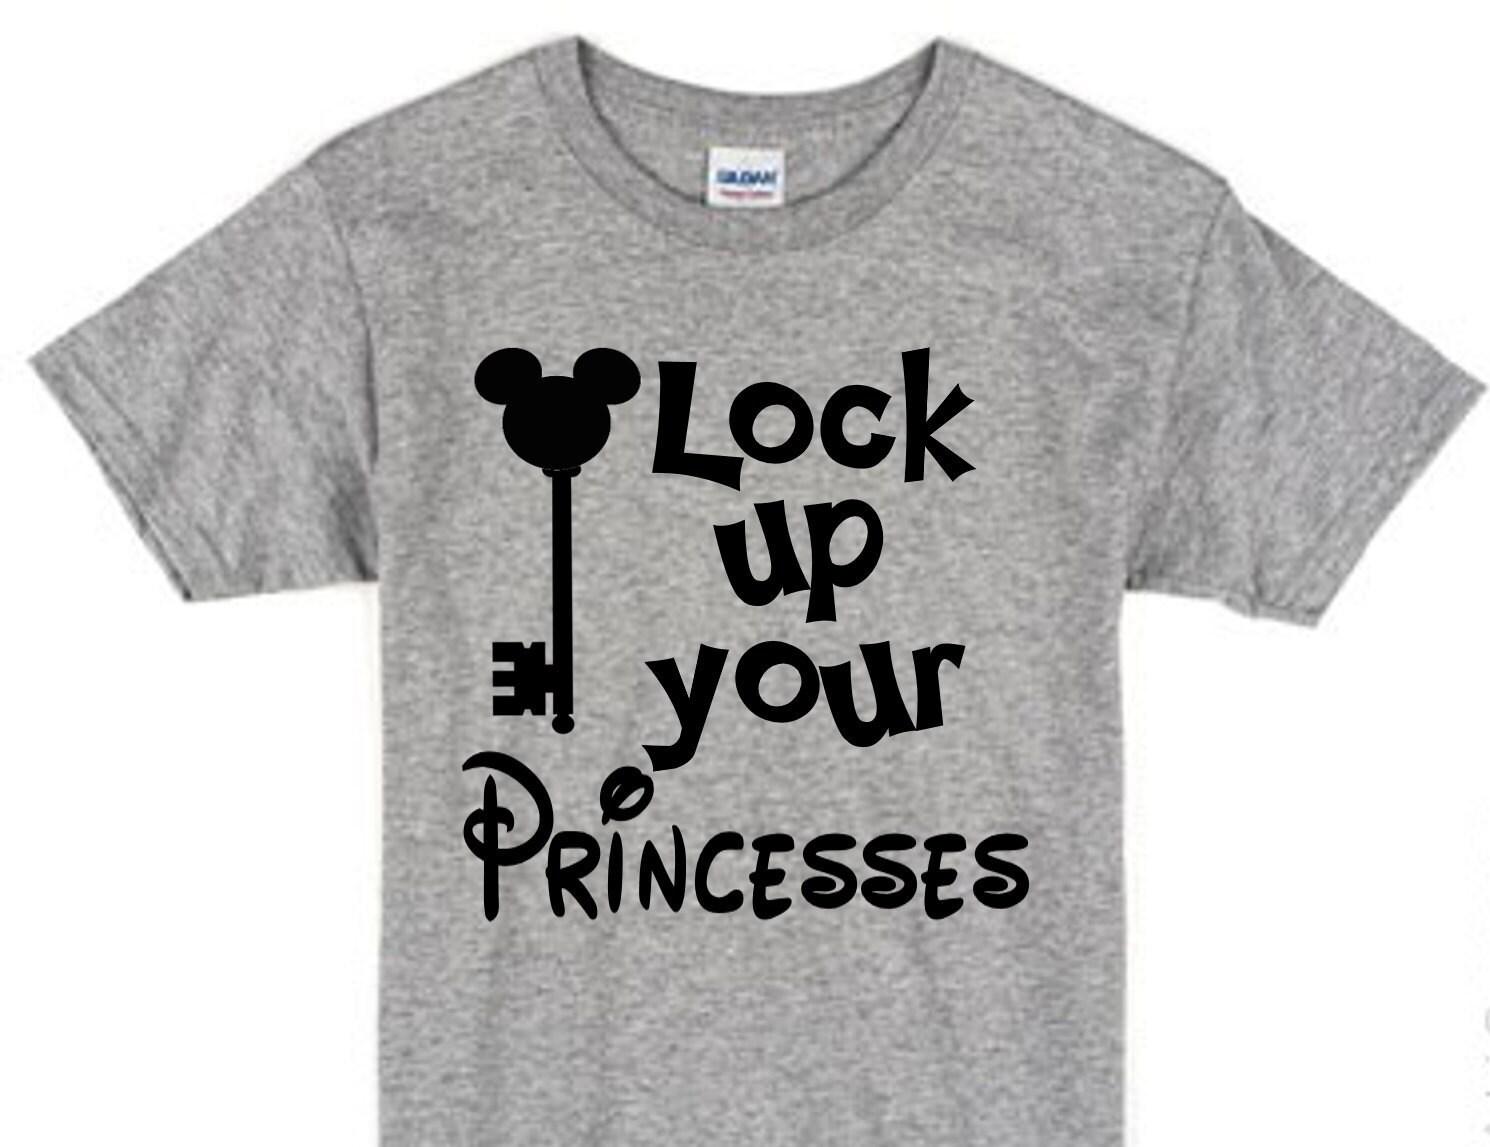 lock up your princesses boys disney t shirt by brightdesignsco. Black Bedroom Furniture Sets. Home Design Ideas